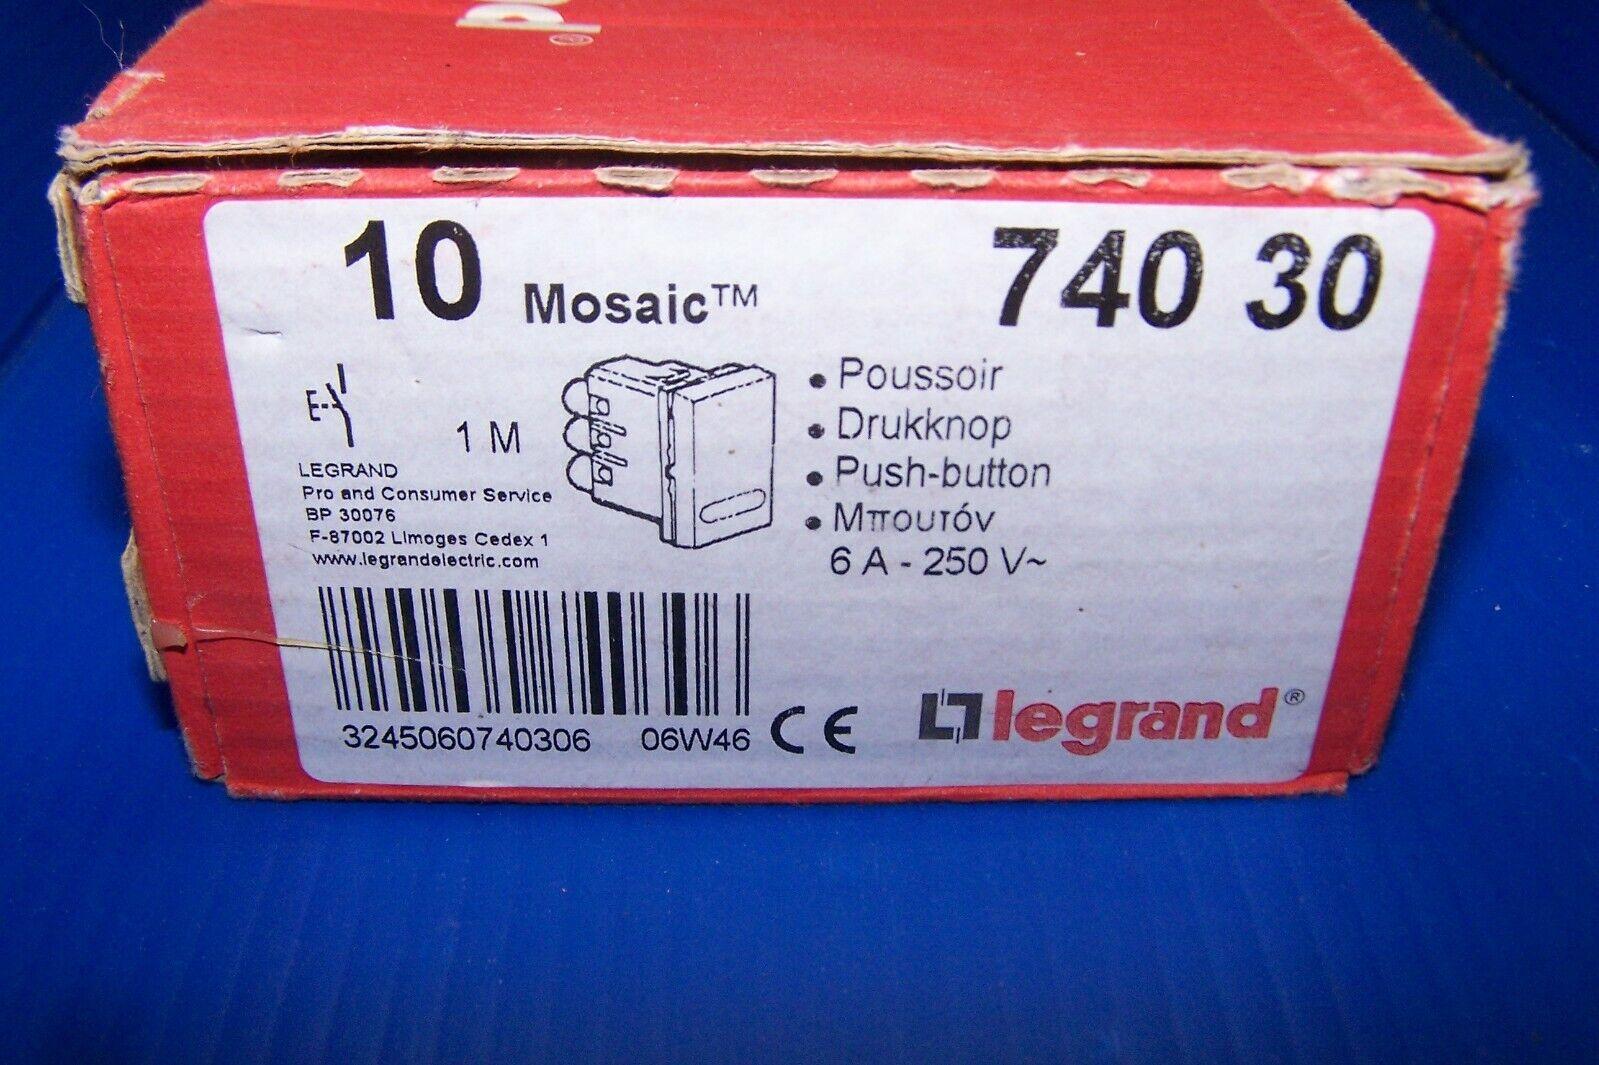 Poussoir LEGRAND Mosaic ref 740 30